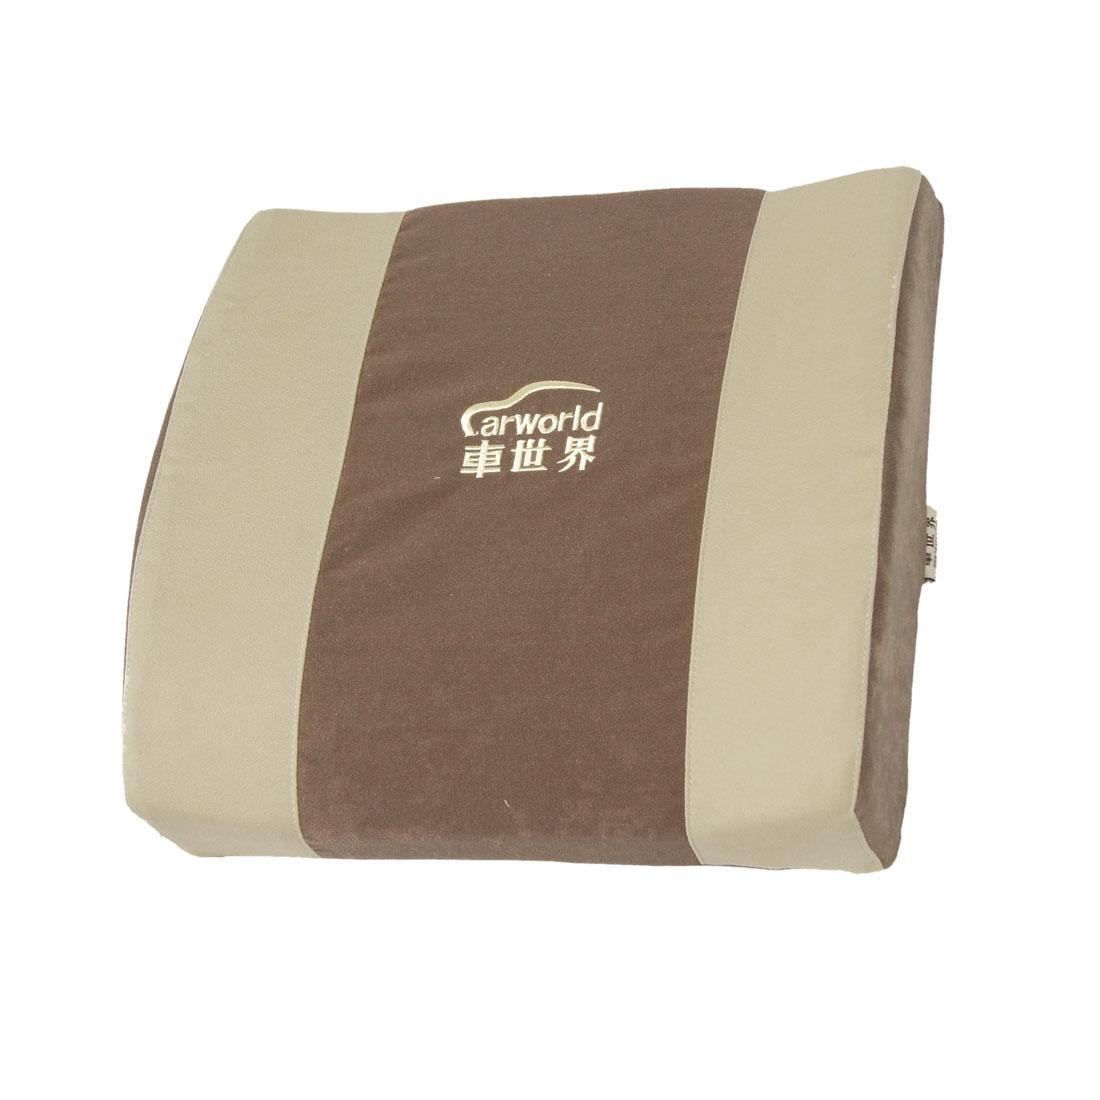 Car Interior Lumbar Back Support Sponge Padded Pillow Cushion Dark Brown Khaki